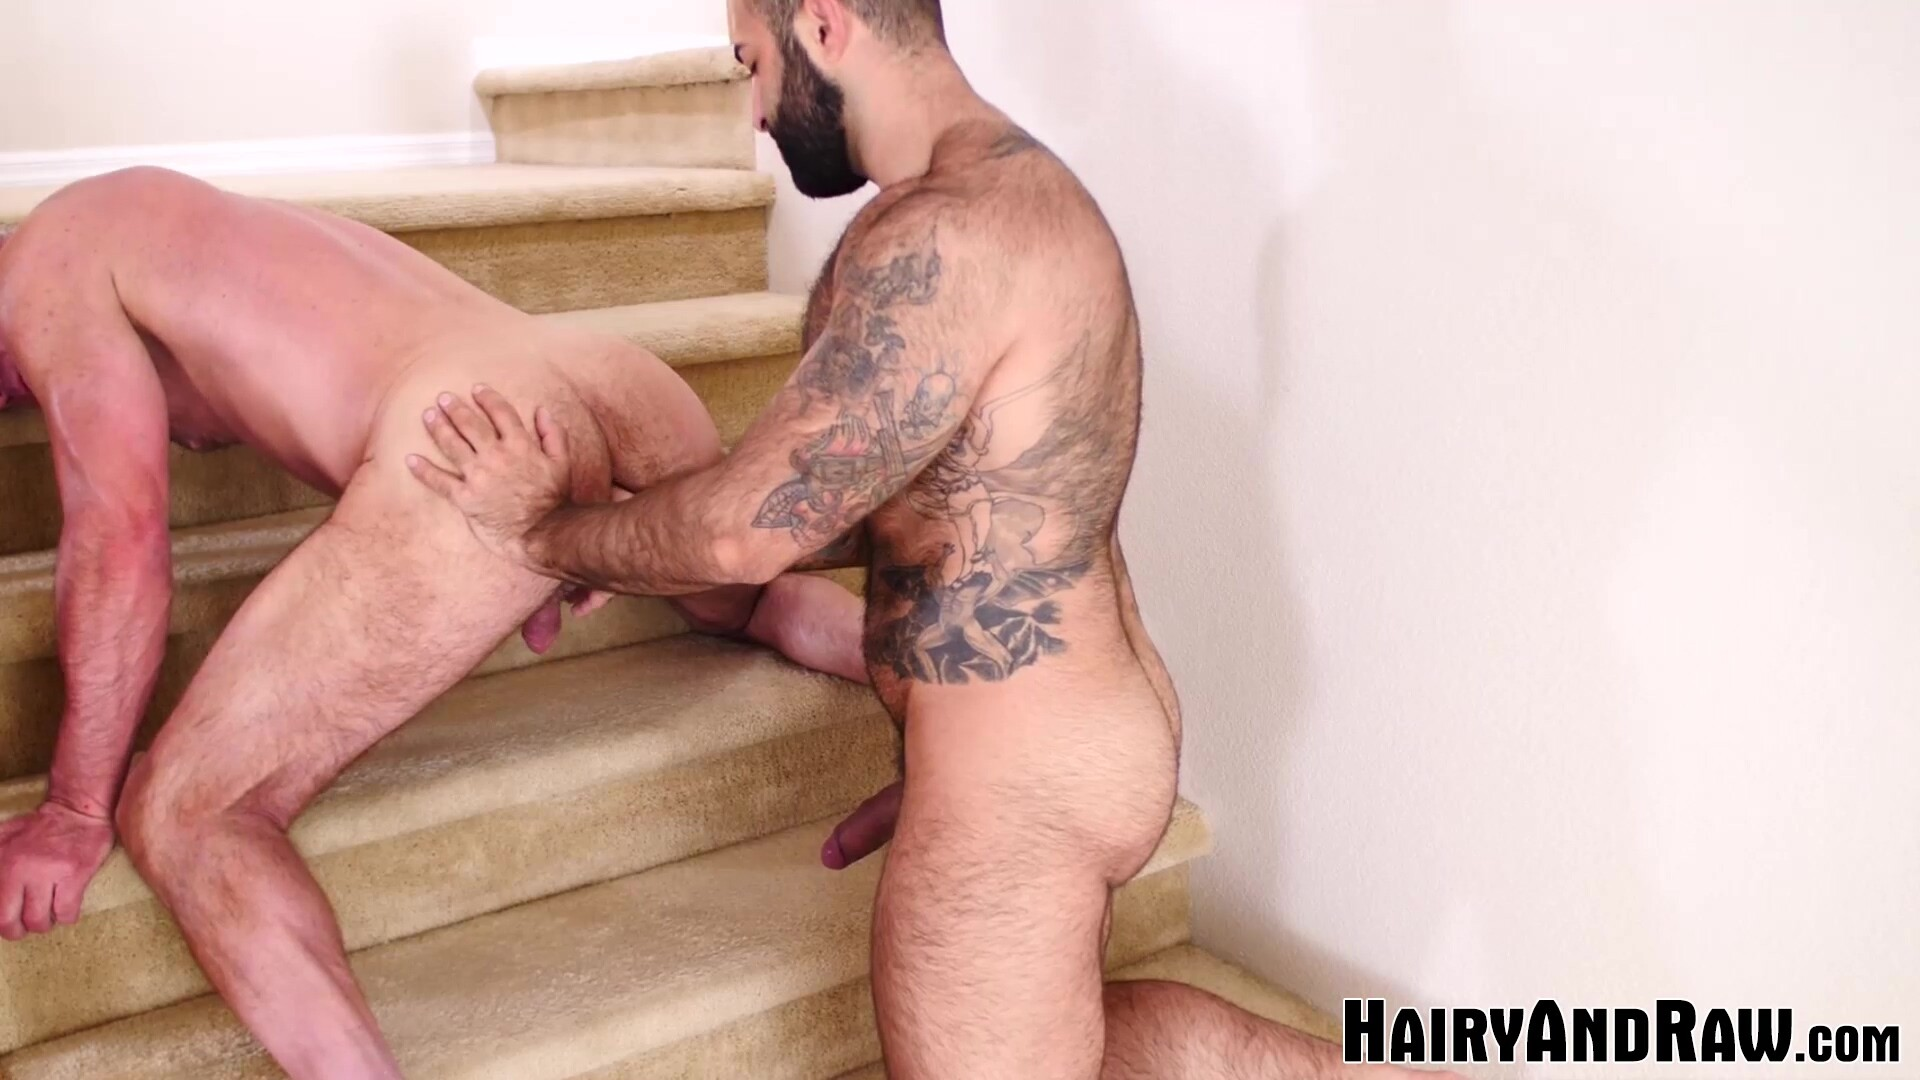 HAIRYANDRAW Hairy Atlas Grant Breeds Mature Dale Savage